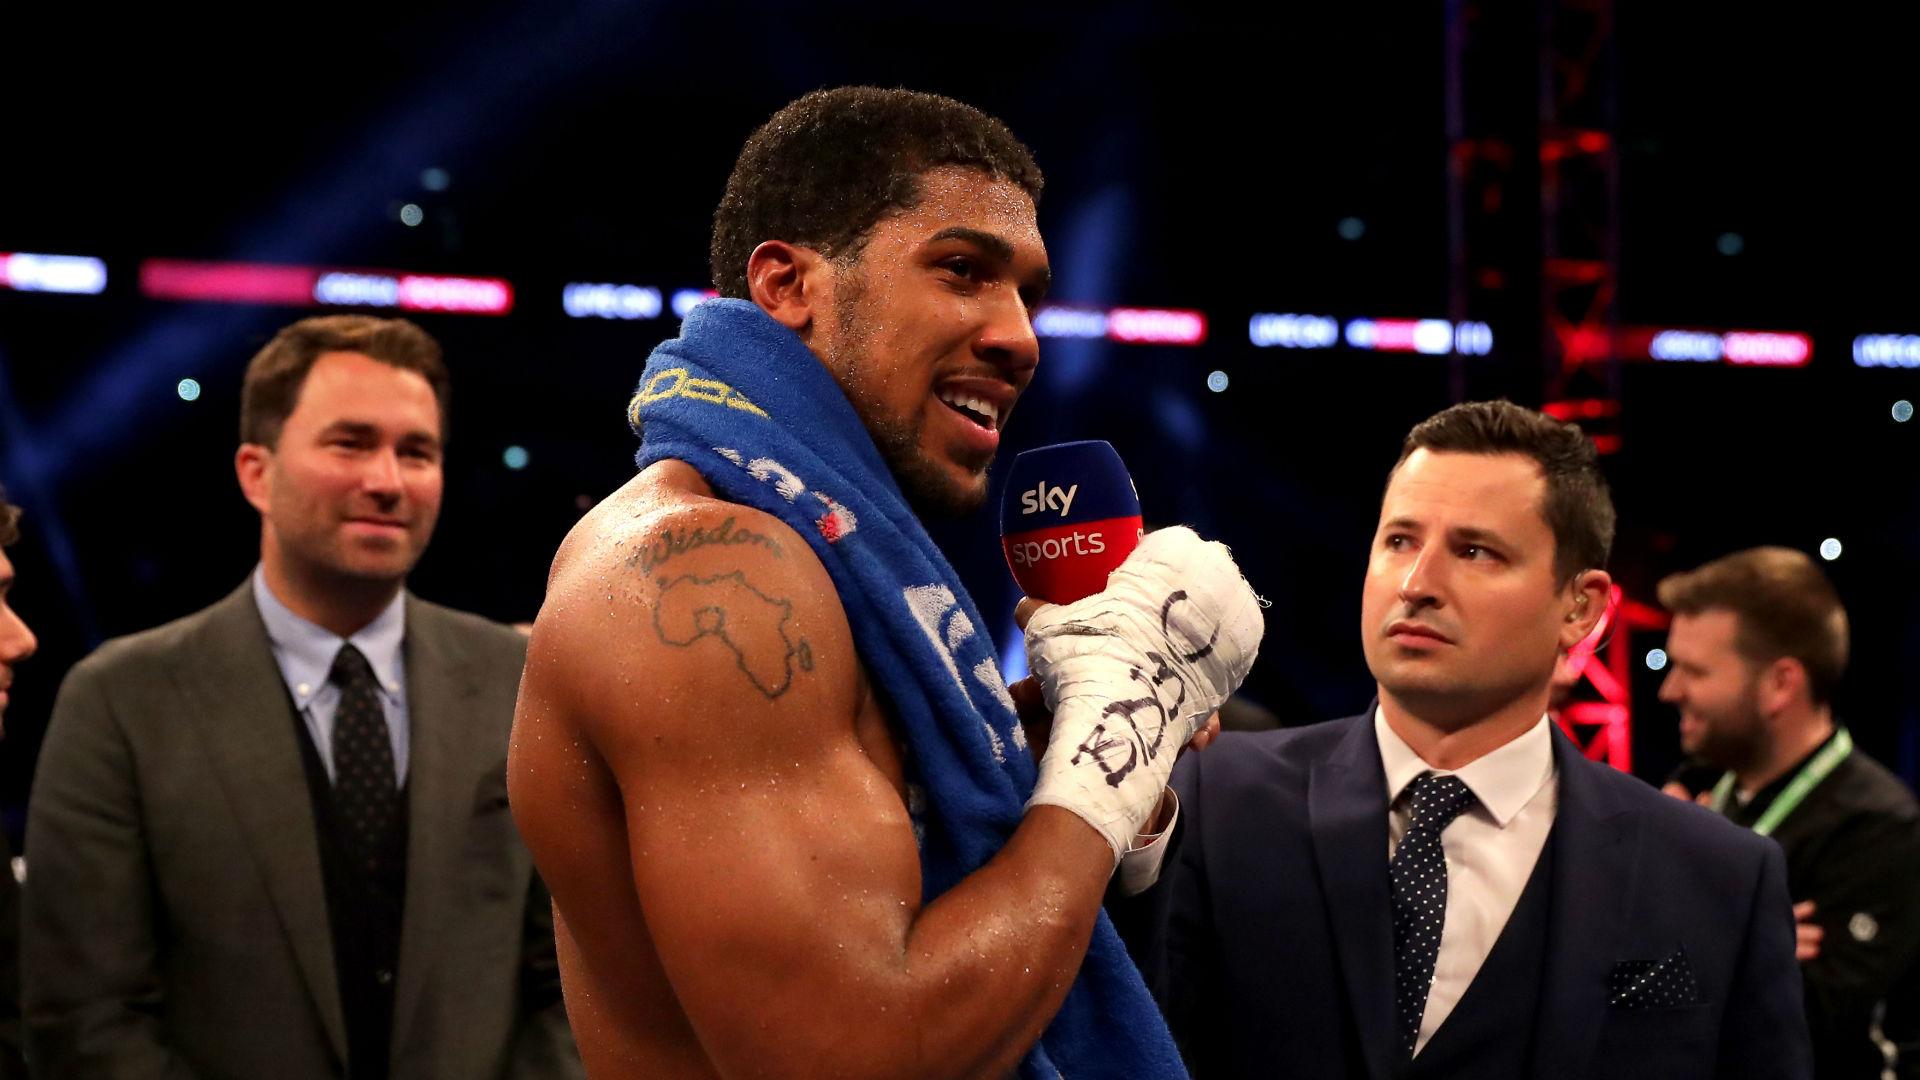 Anthony Joshua stops Povetkin to retain world heavyweight titles